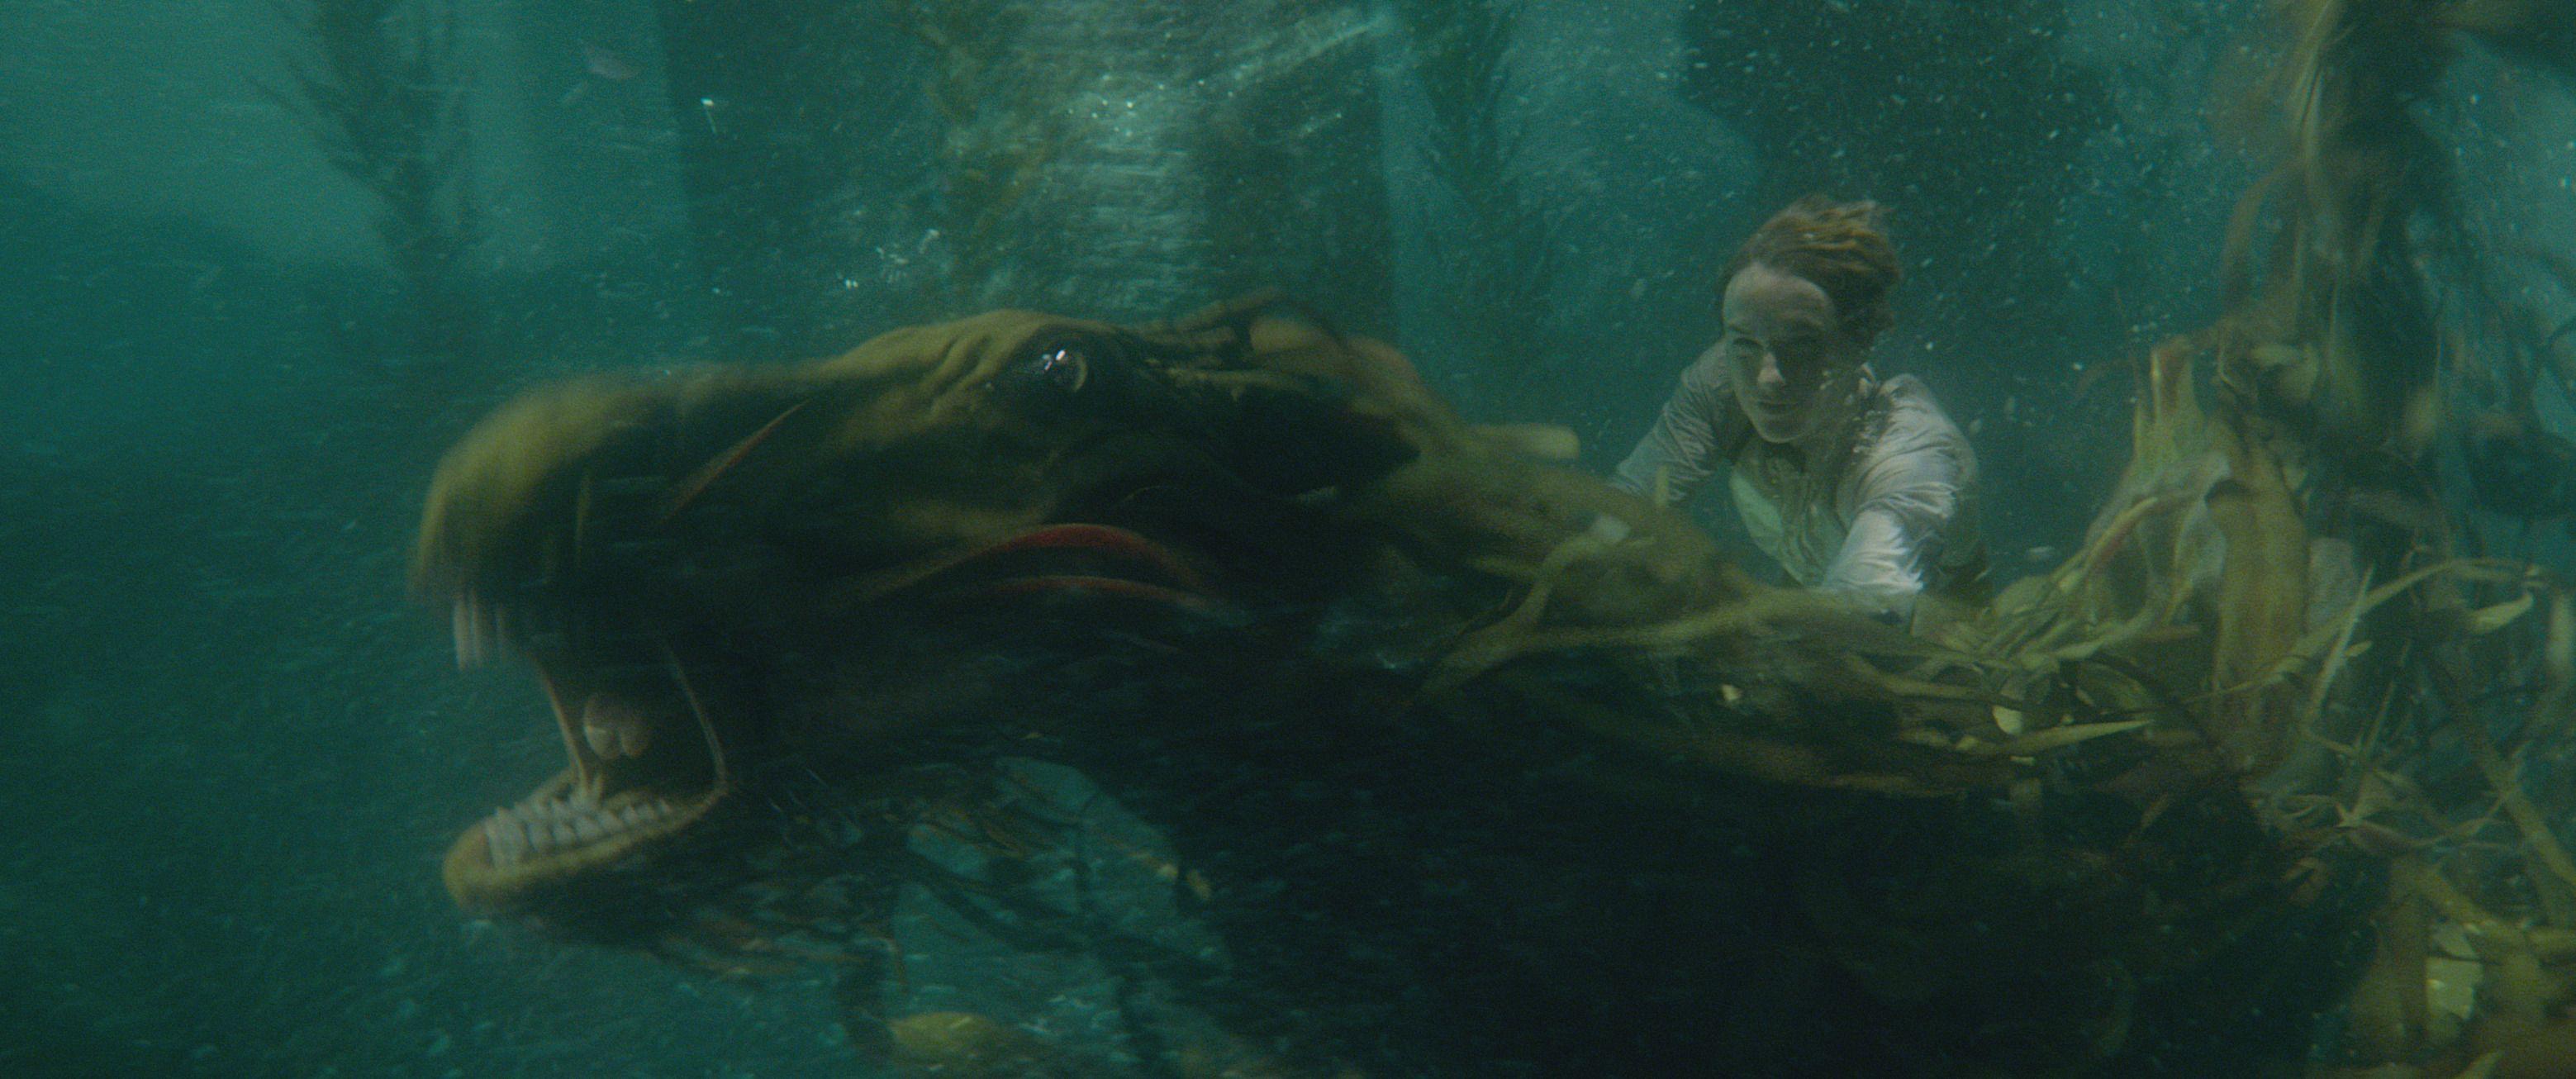 Fantastic Beasts 2